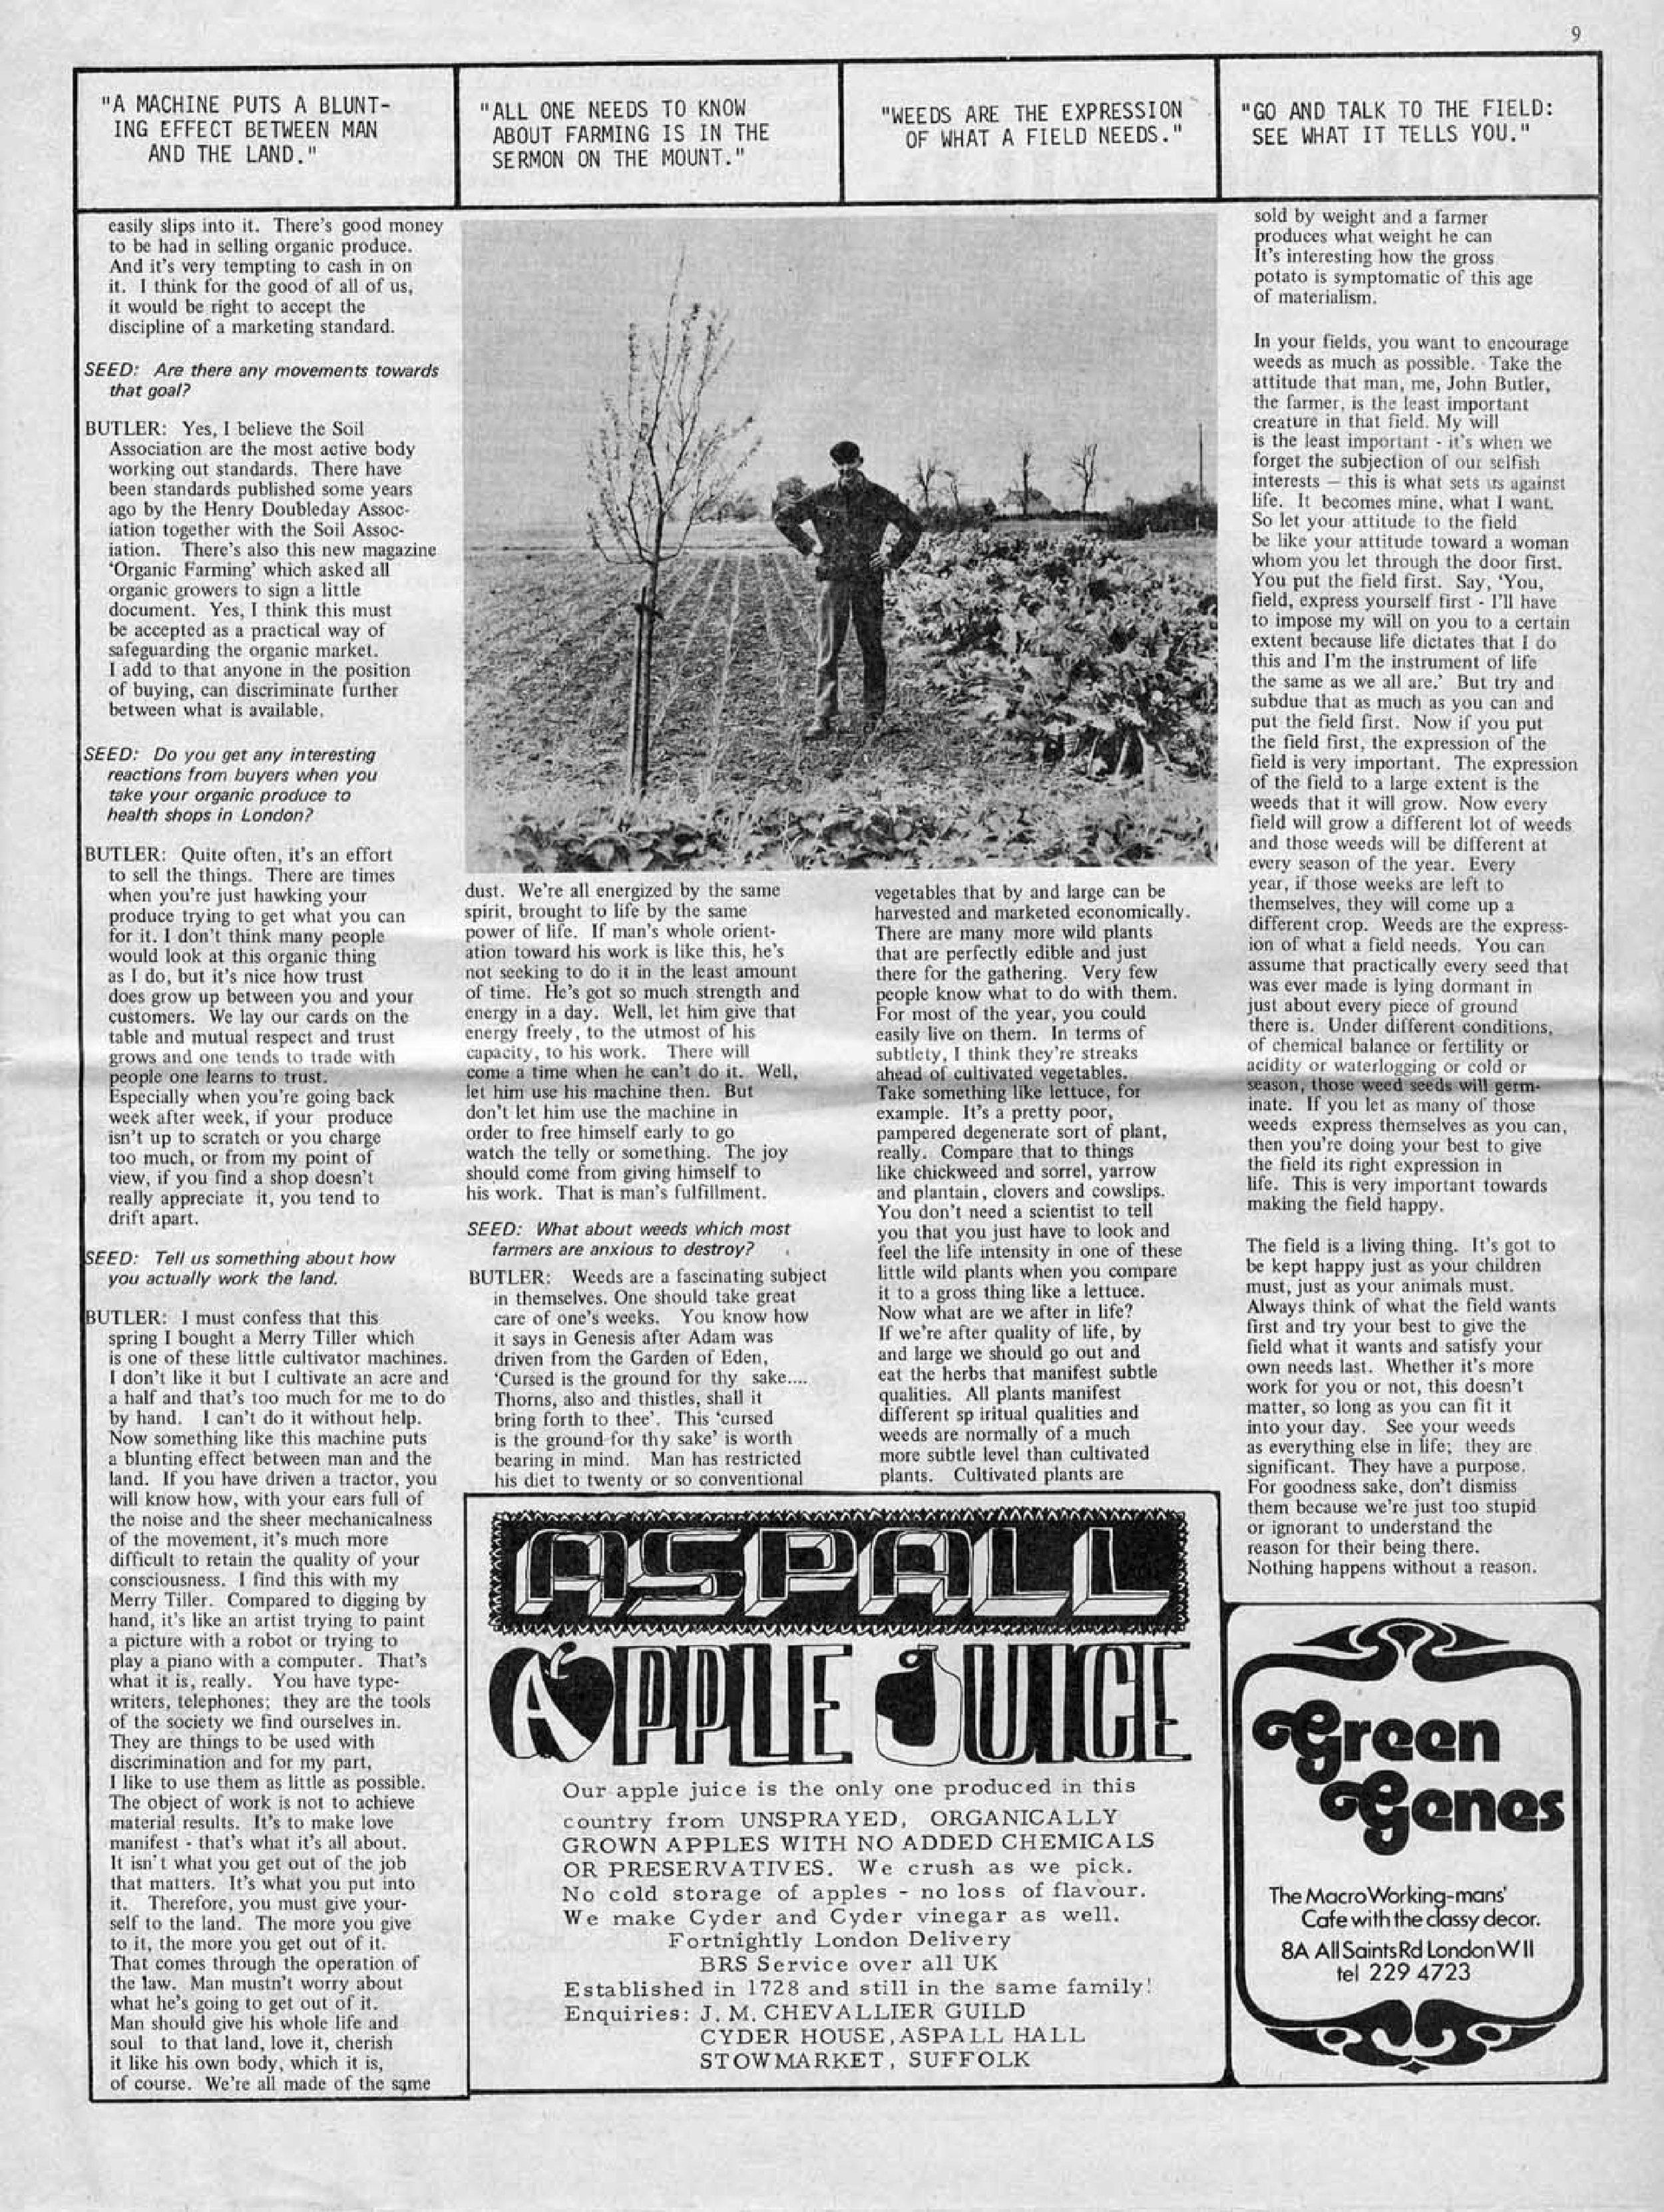 seed-v1-n3-april1972-09.jpg